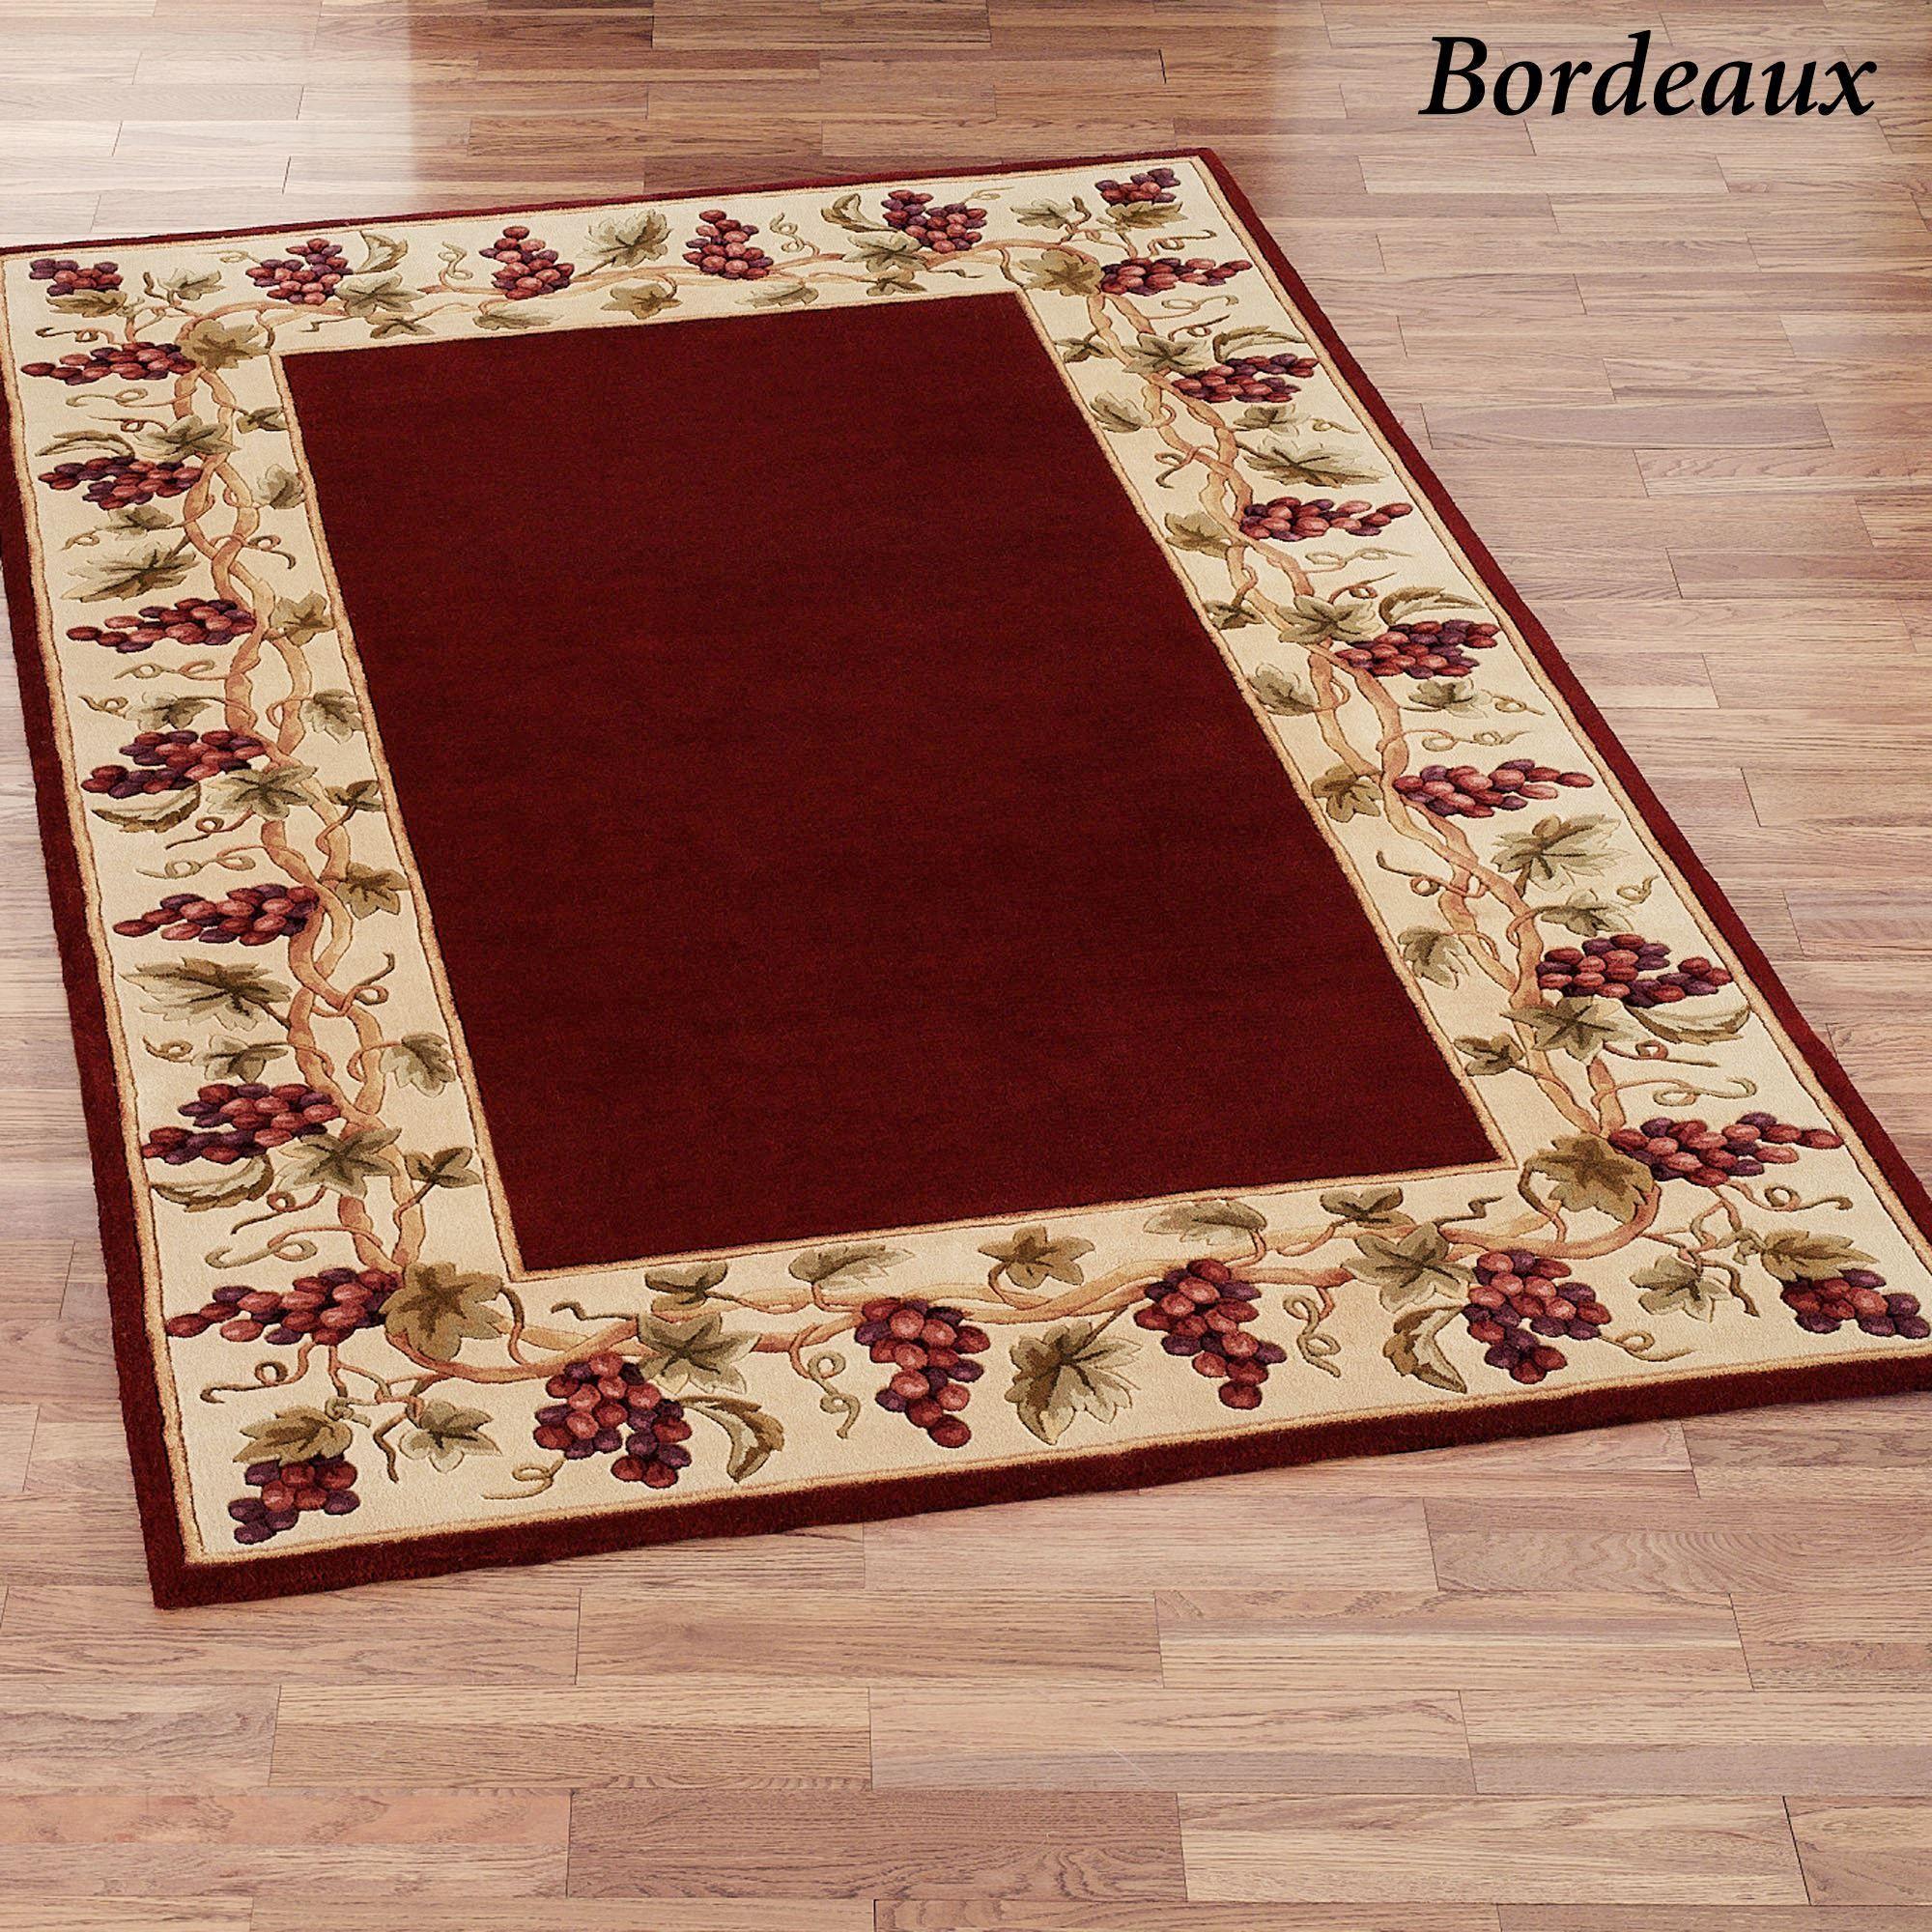 Bordeaux border area rug area rugs round area rugs